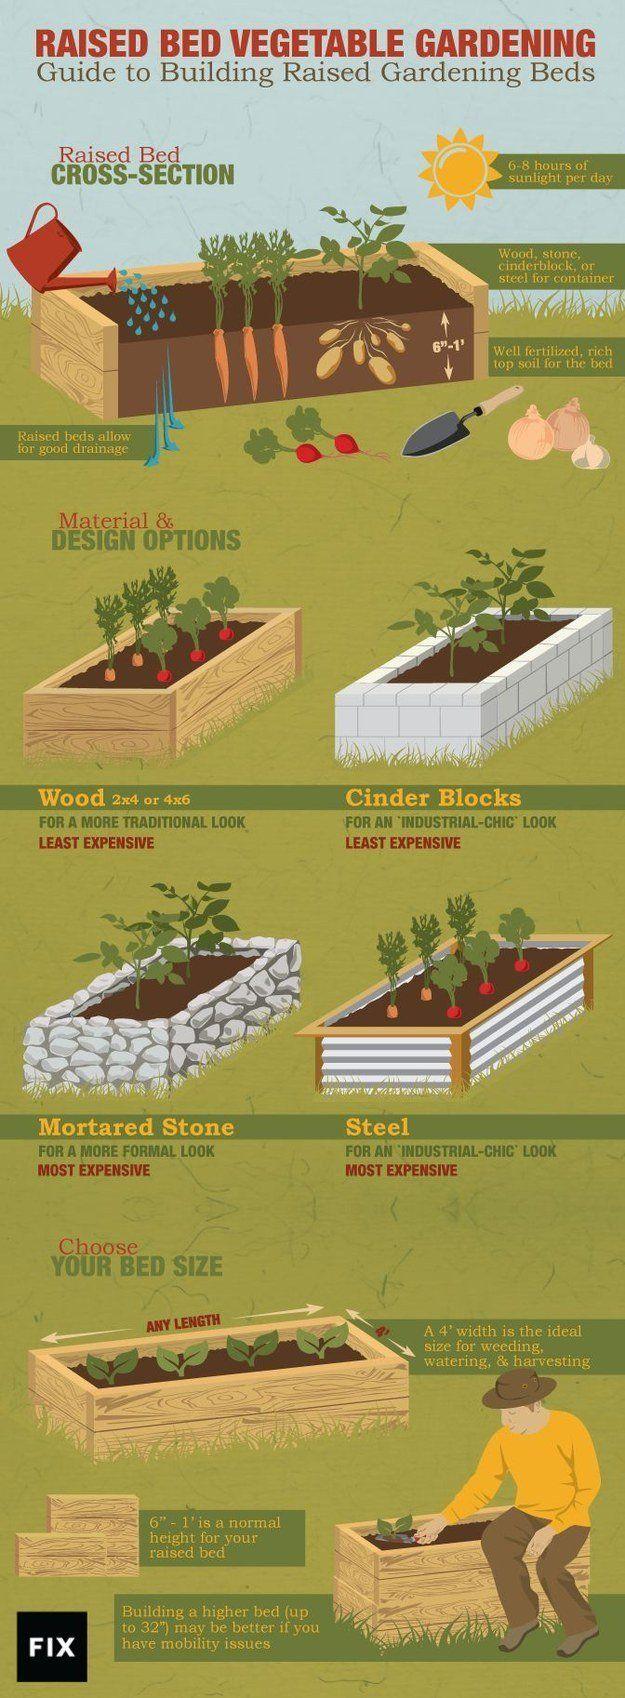 raised-beds